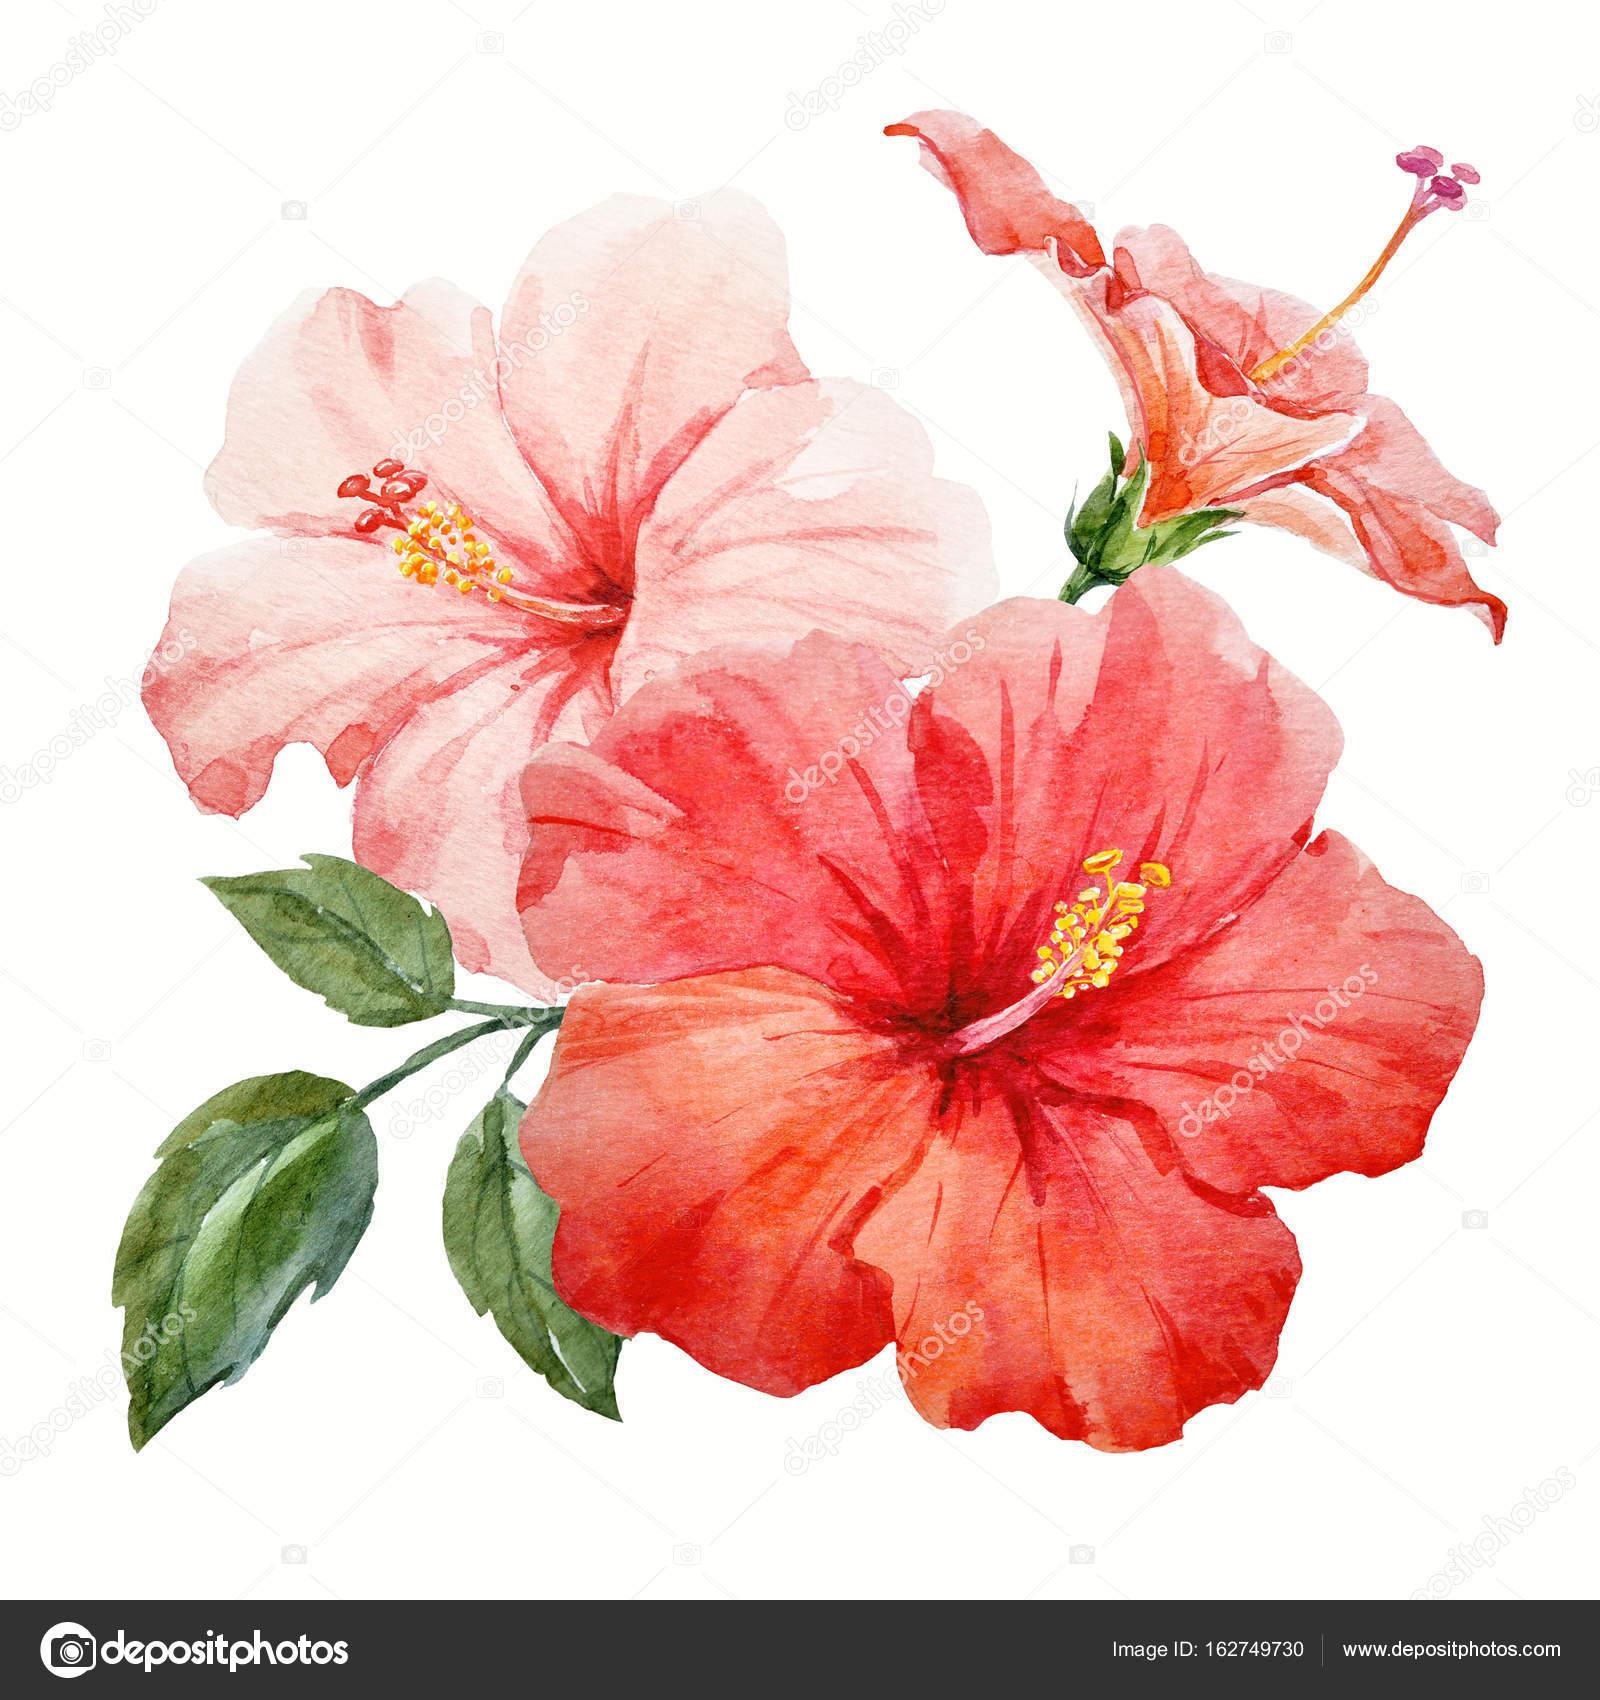 Watercolor tropical hibiscus flower stock photo zeninaasya beautiful watercolor hand drawn tropical hibiscus flower illustration photo by zeninaasya izmirmasajfo